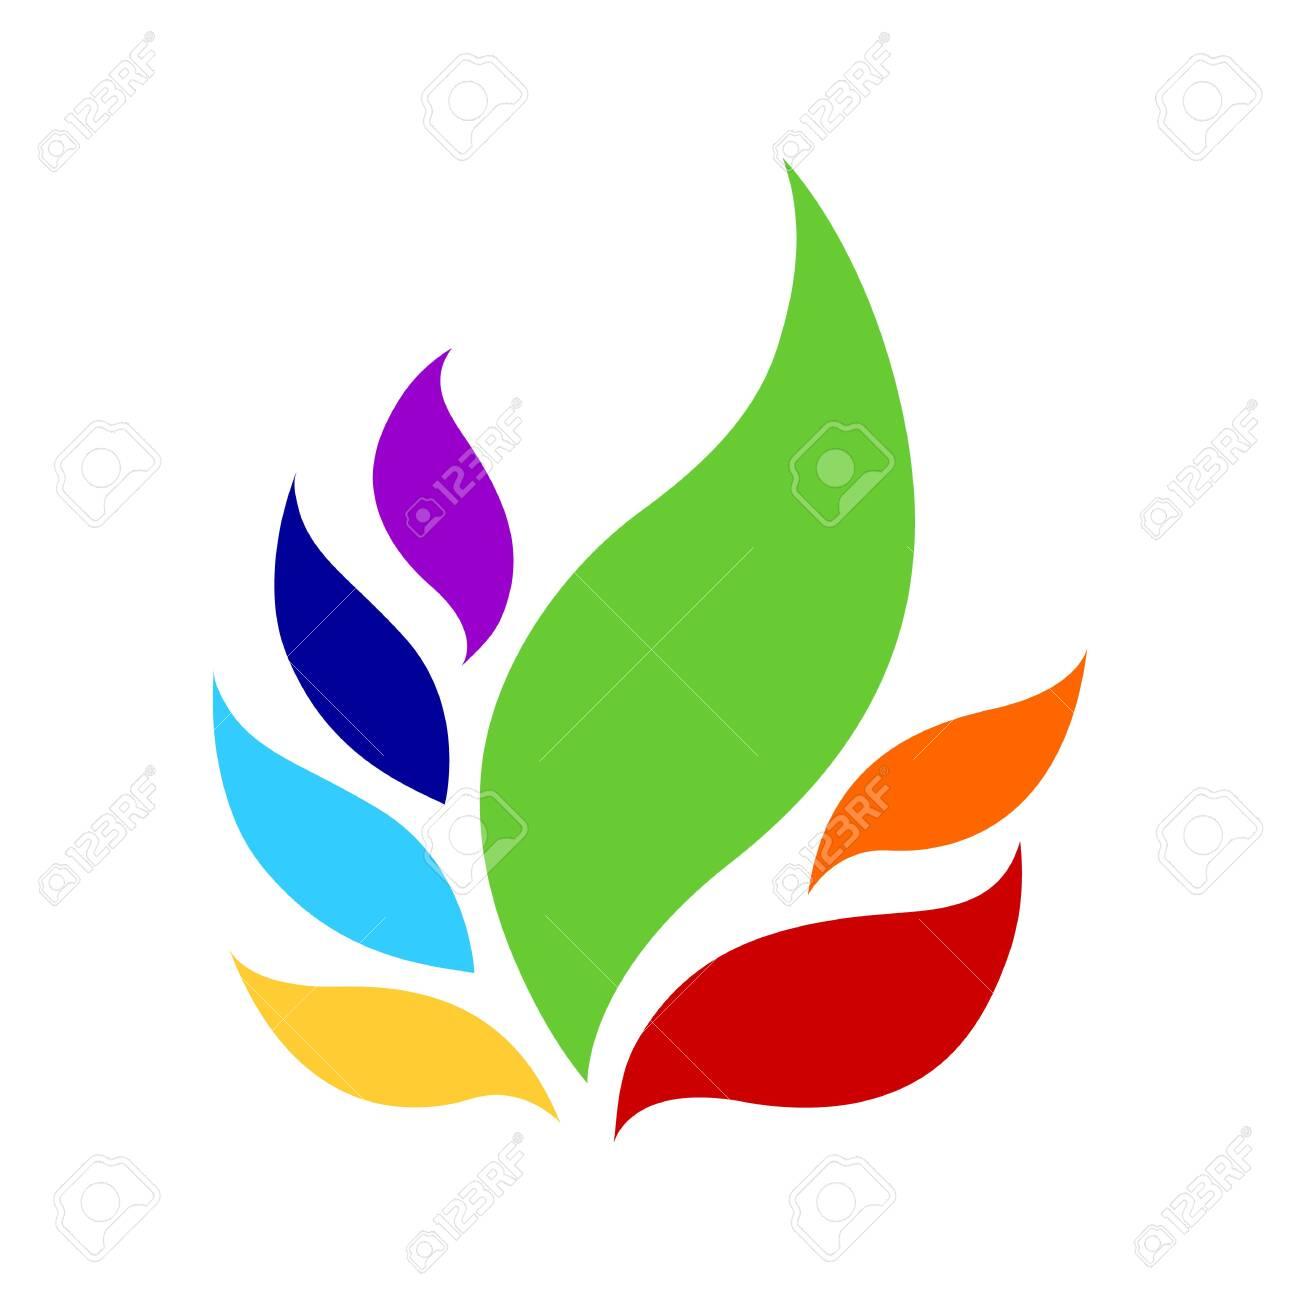 7 chakra color icon symbol logo sign, flower floral, vector design illustration concept drawing - 143621175